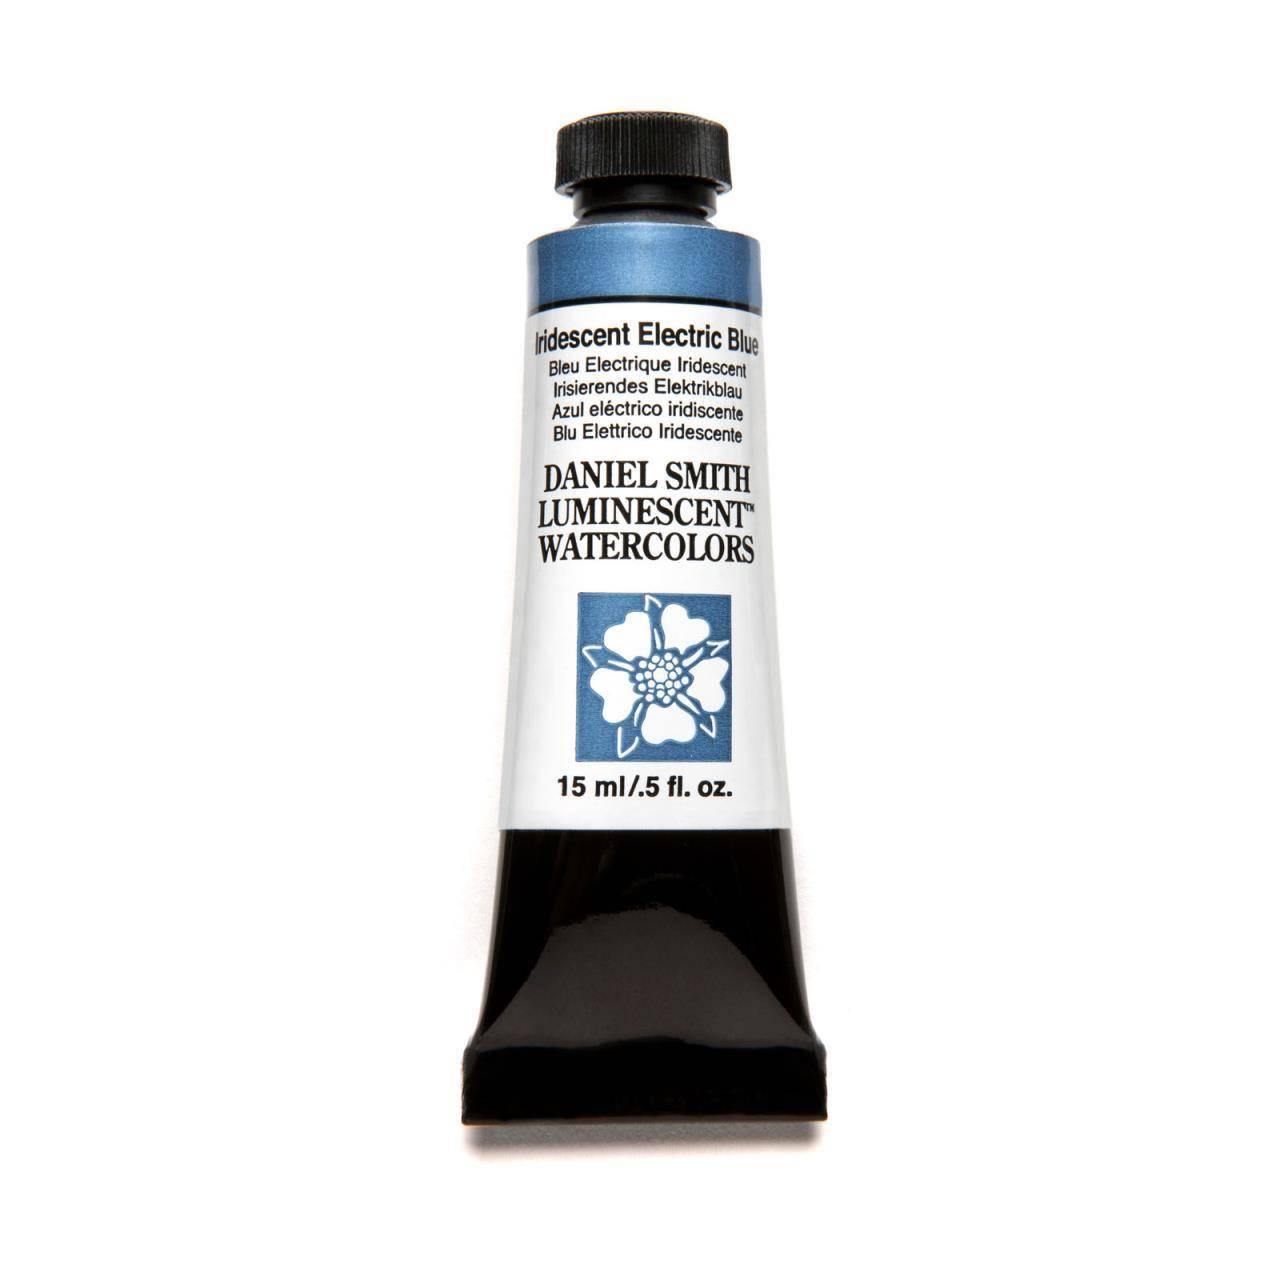 Daniel Smith Iridescent Electric Blue